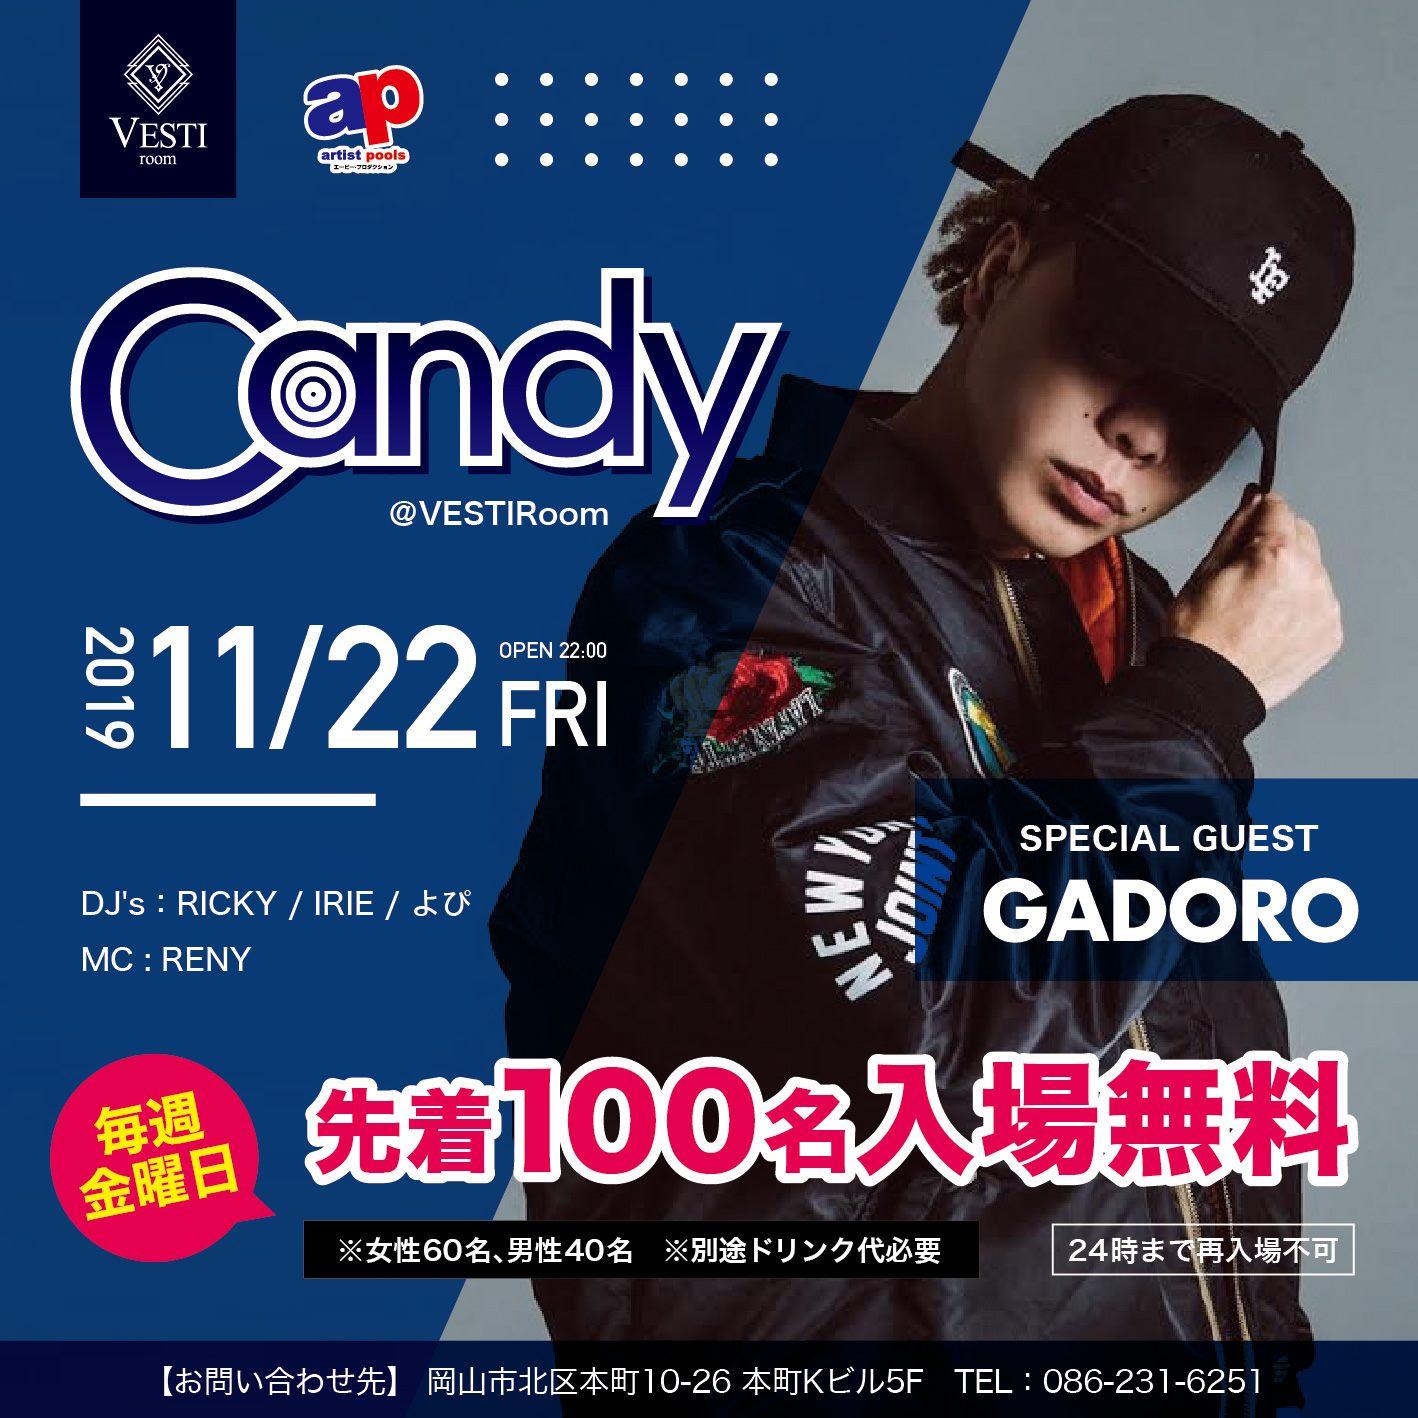 CANDY - SPECIAL GUEST GADORO -